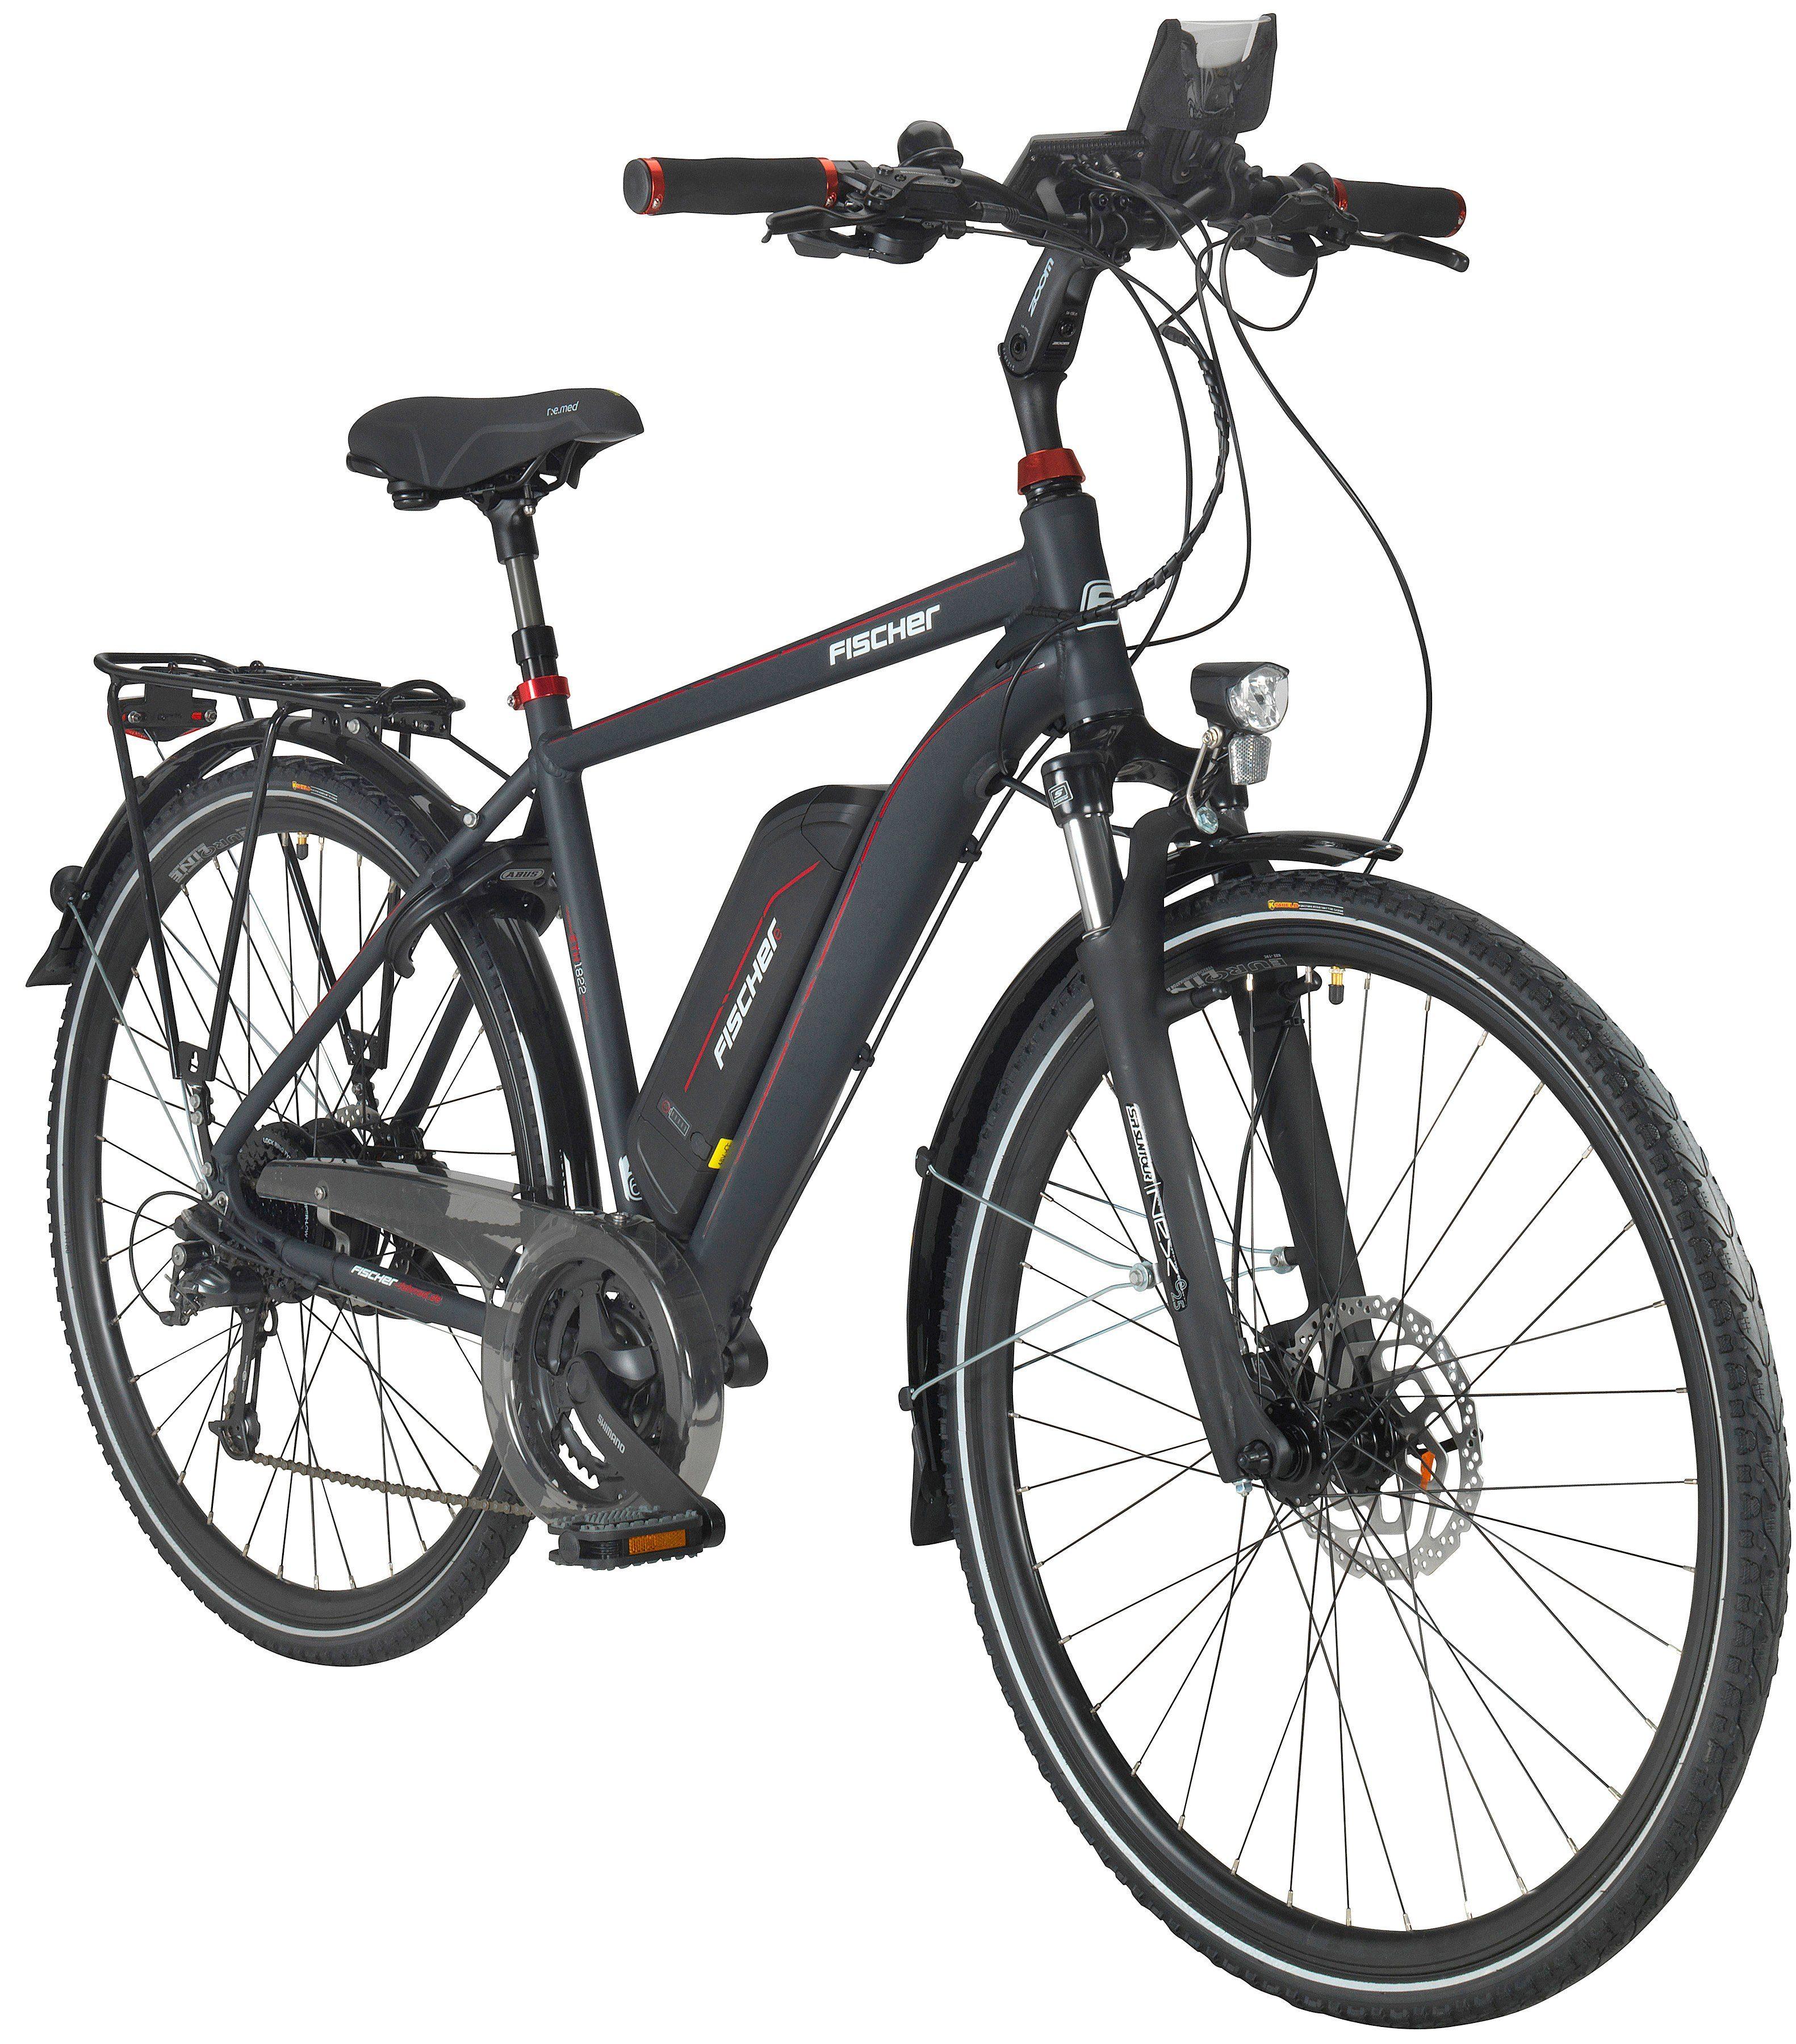 FISCHER FAHRRAEDER E-Bike Trekking Herren »ETH1822«, 71,12 cm (28 Zoll), 24 Gänge, 557 Wh, Heckmotor